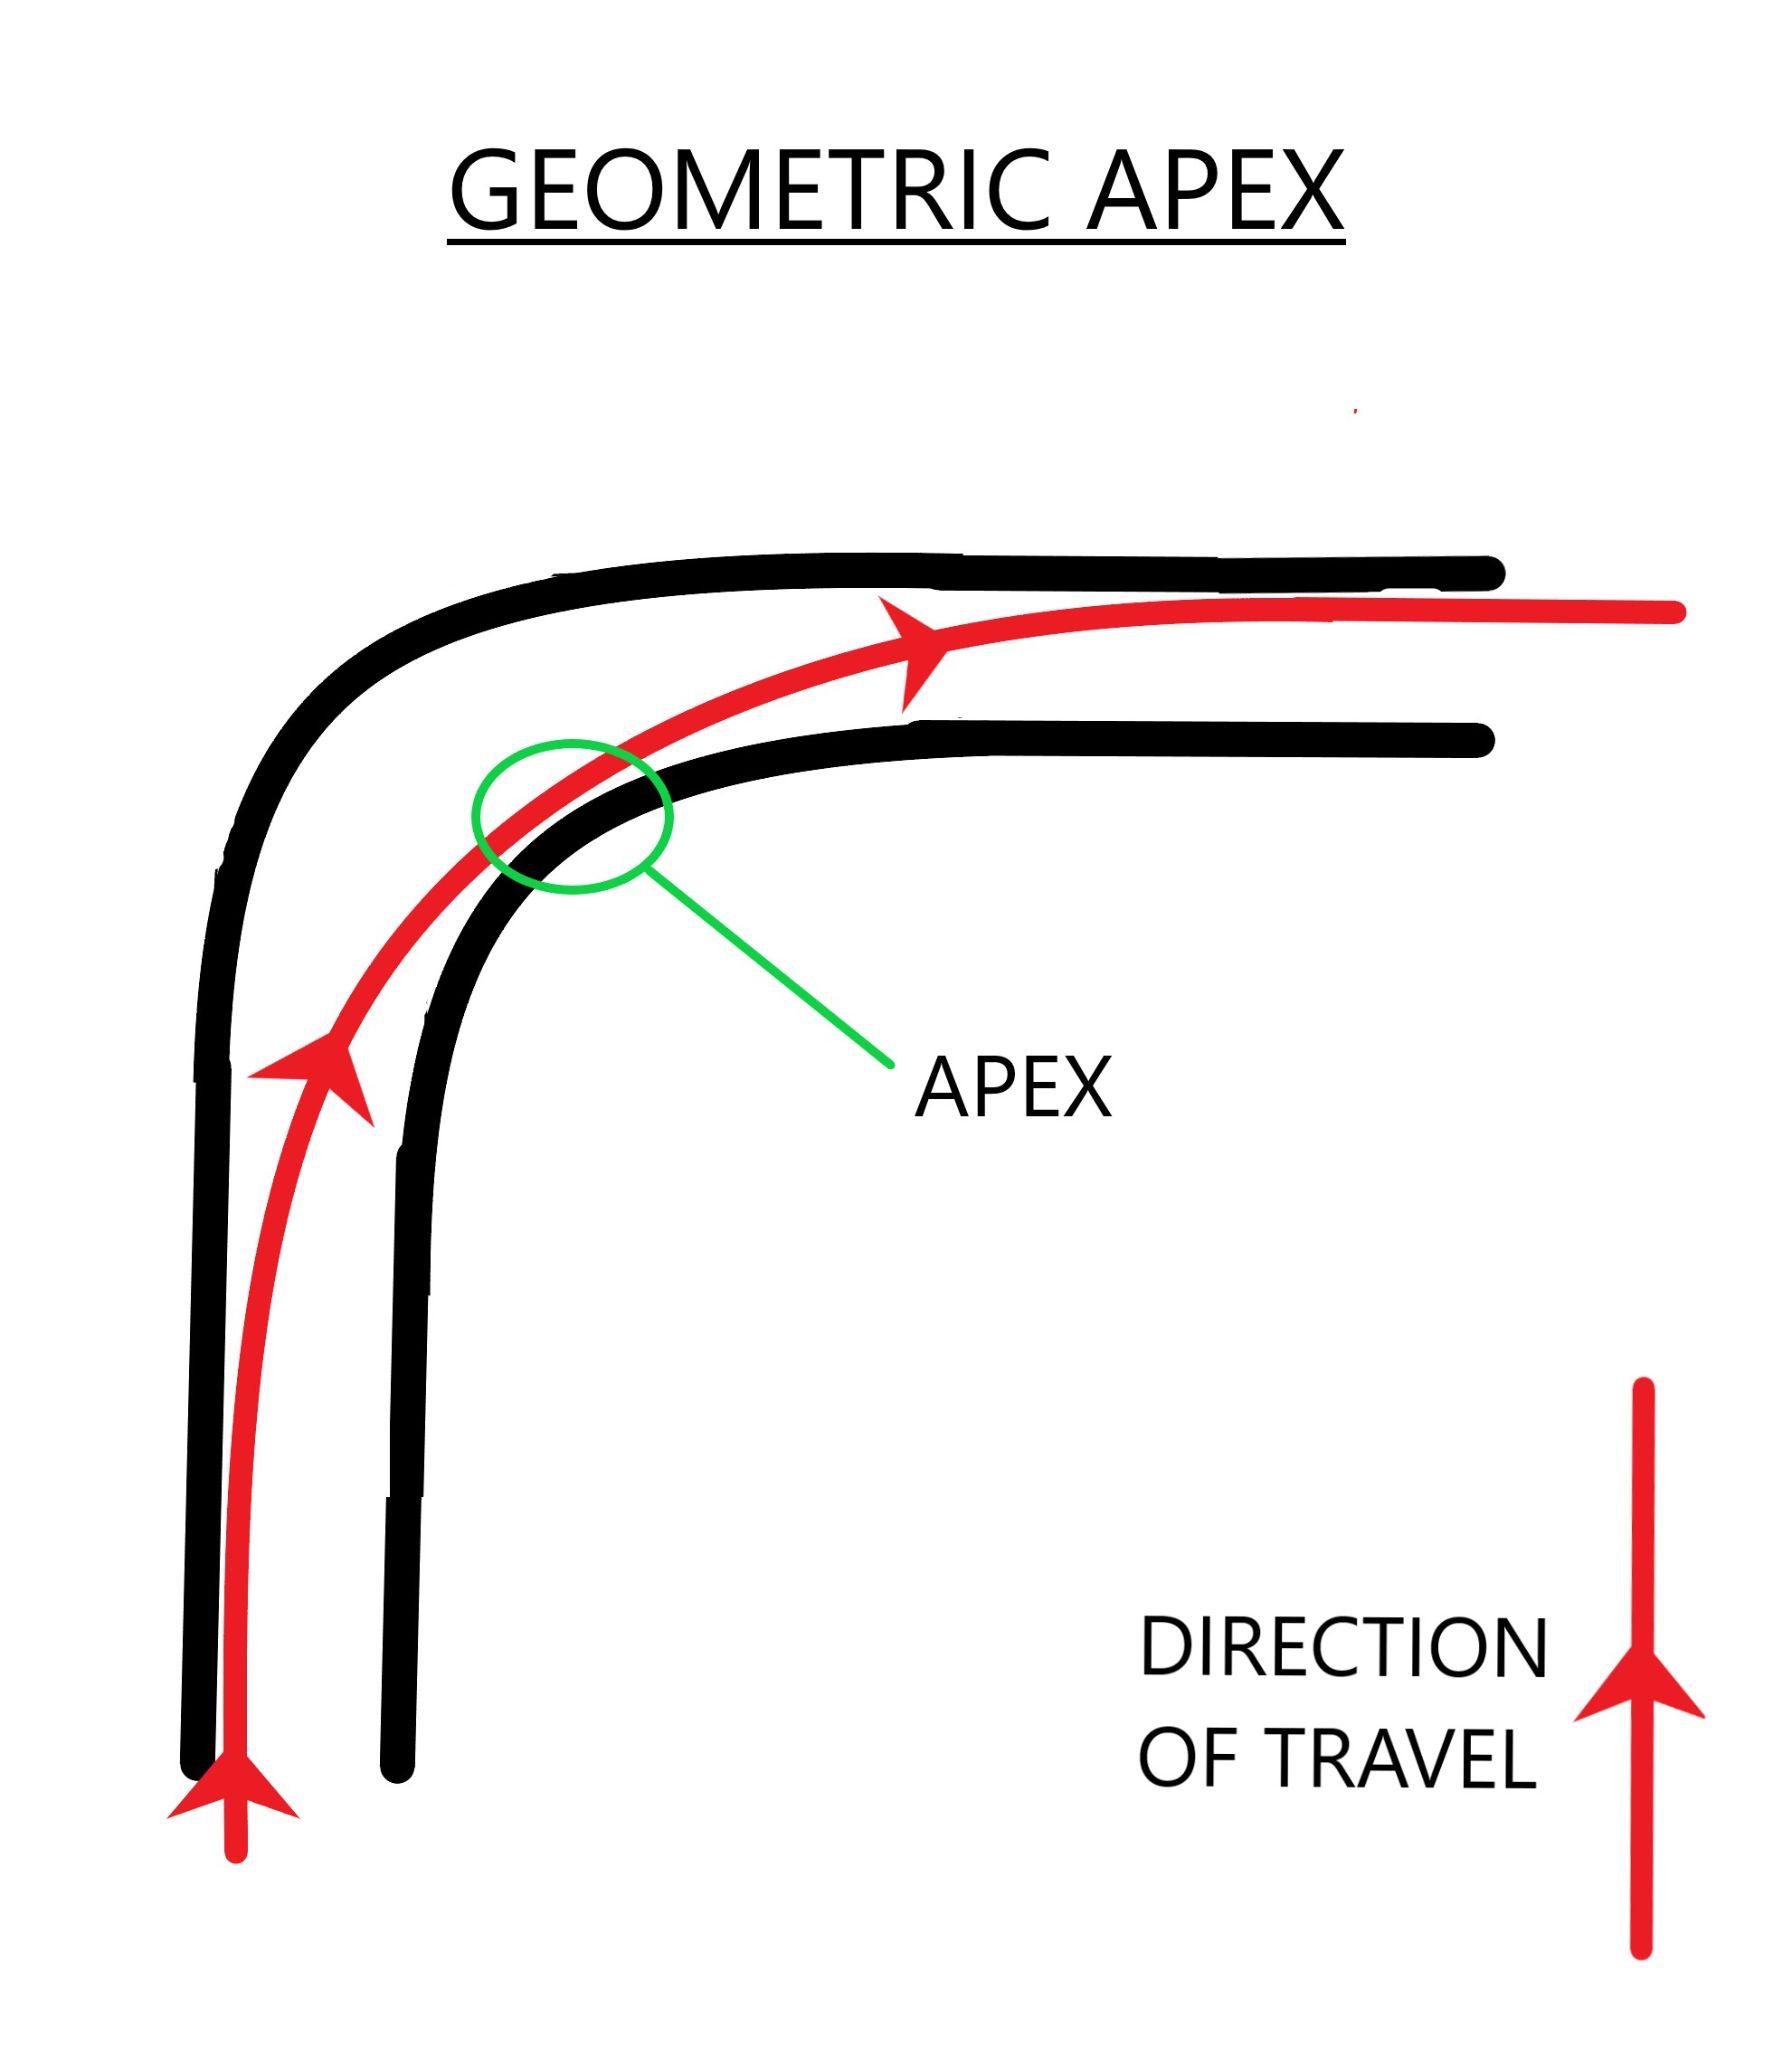 longboarding through turns - geometric apex